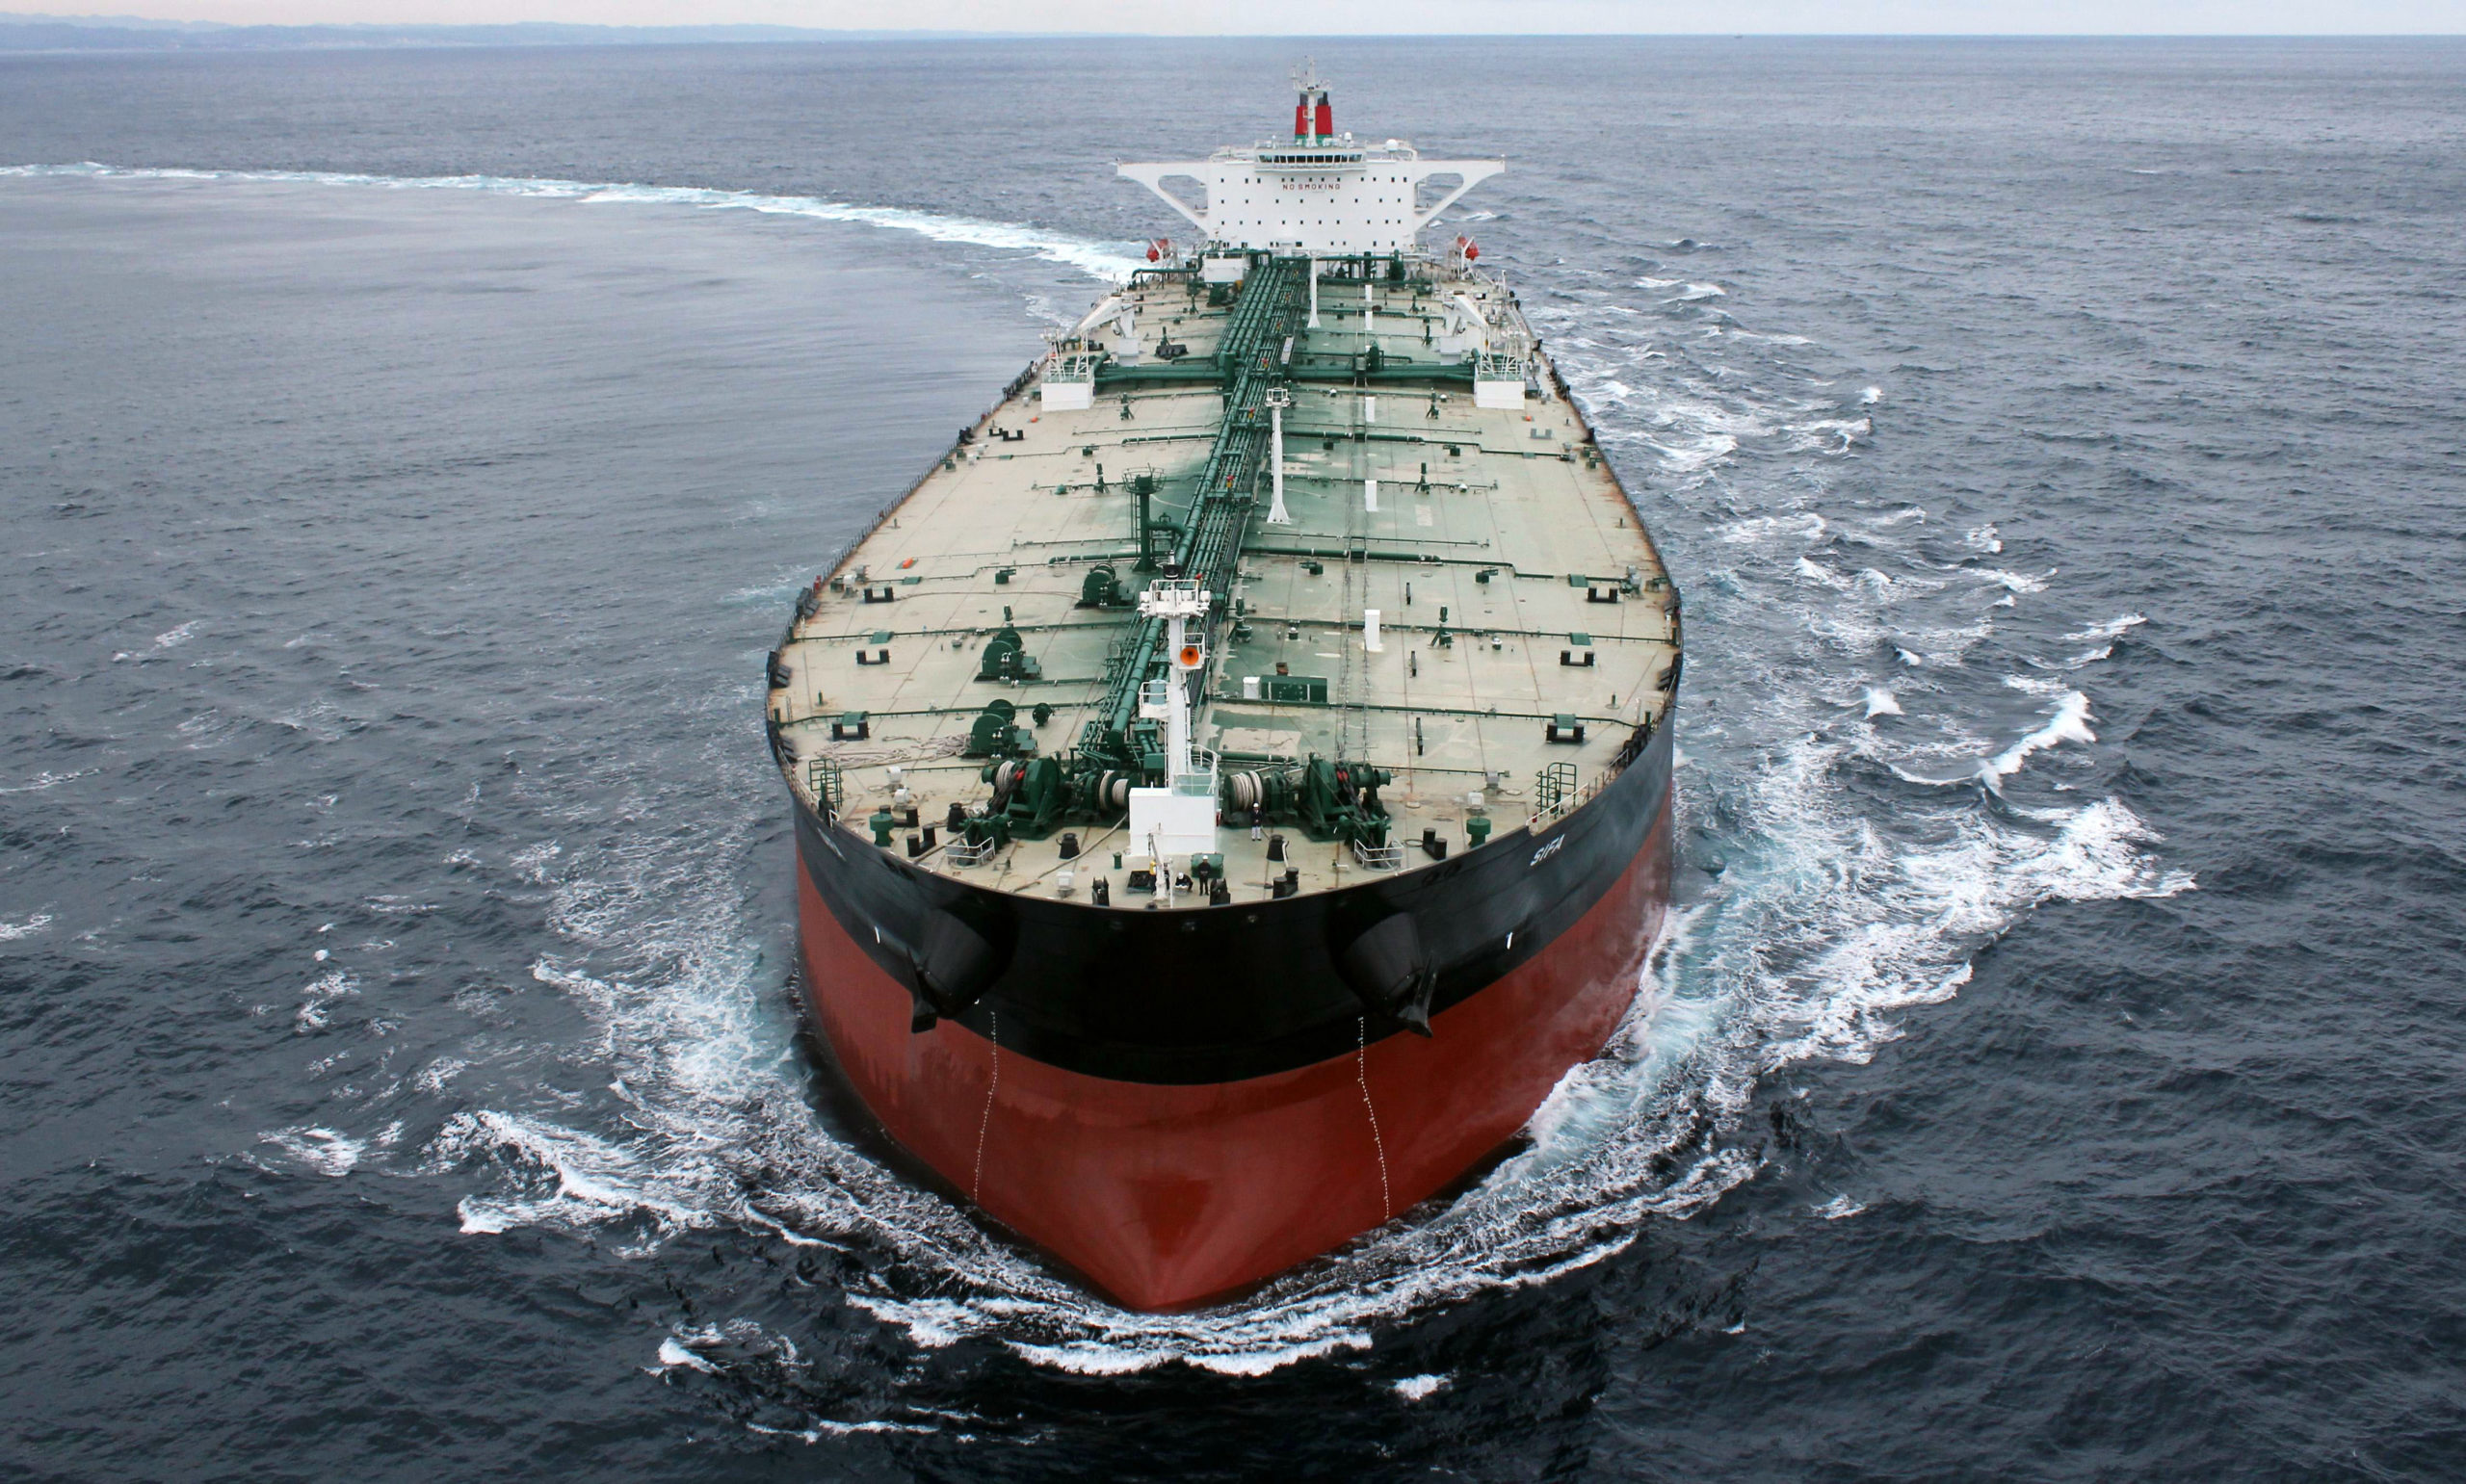 Shipboard Inerting